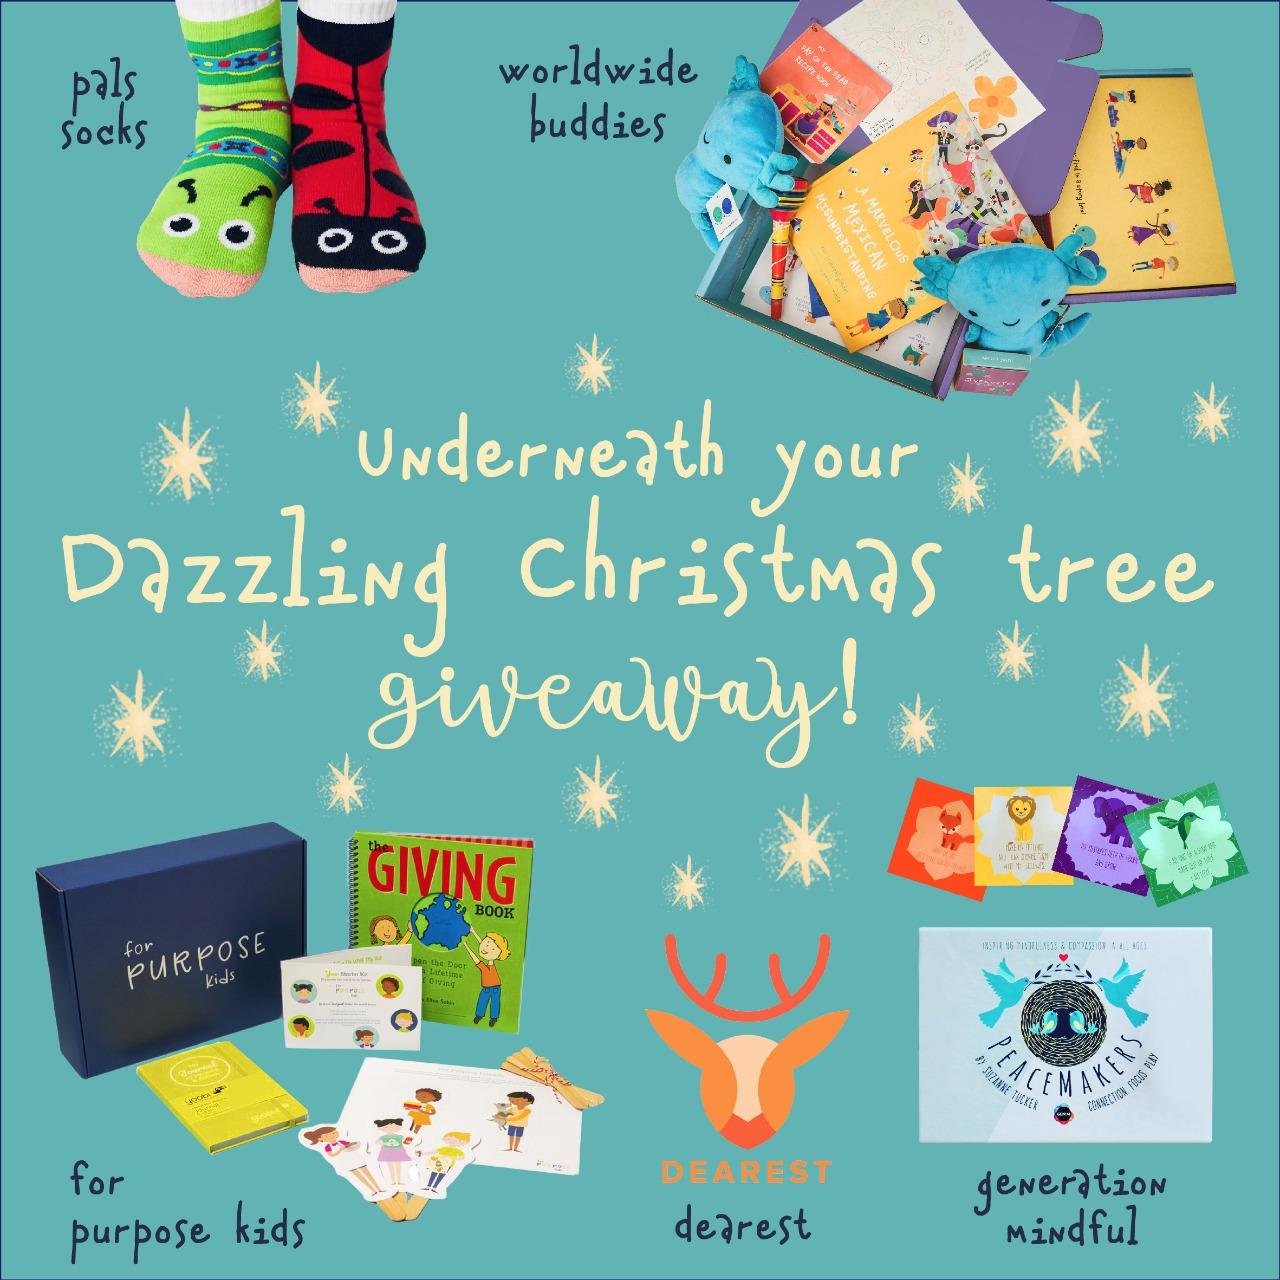 christmas_tree_giveaway_worldwide_buddies.jpeg